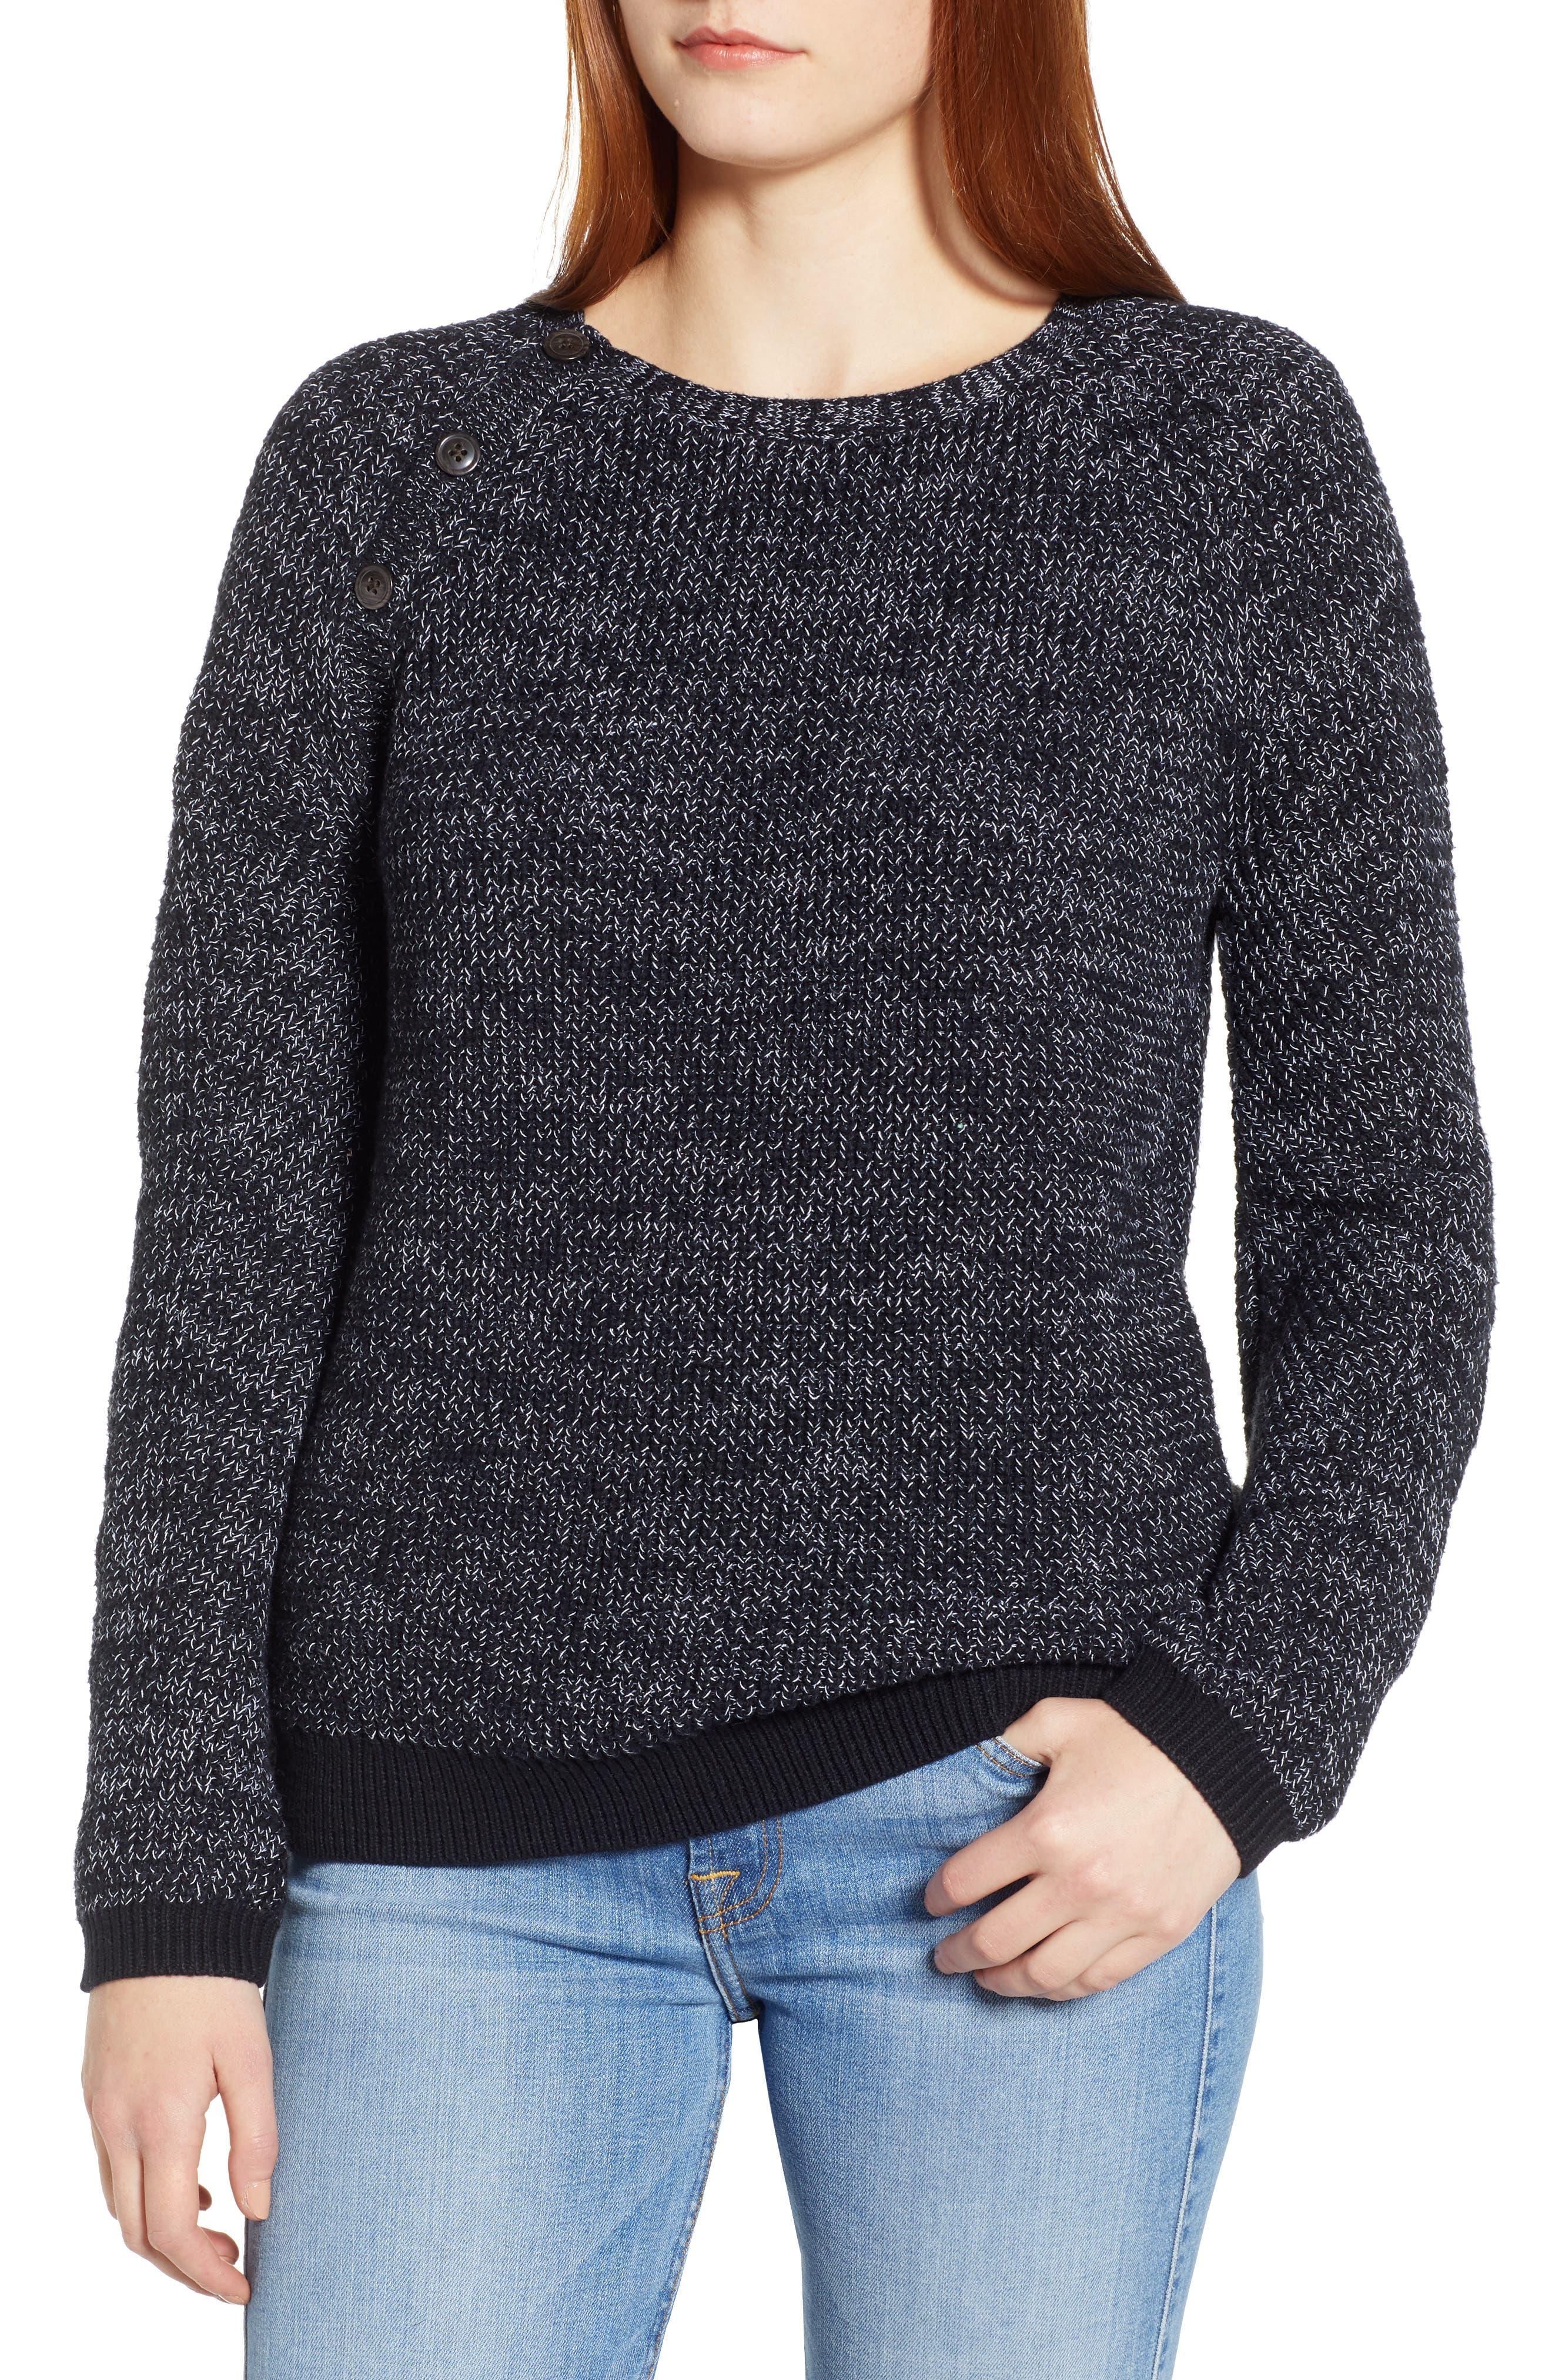 Raglan Sleeve Sweater,                         Main,                         color, BLACK CREW MARL